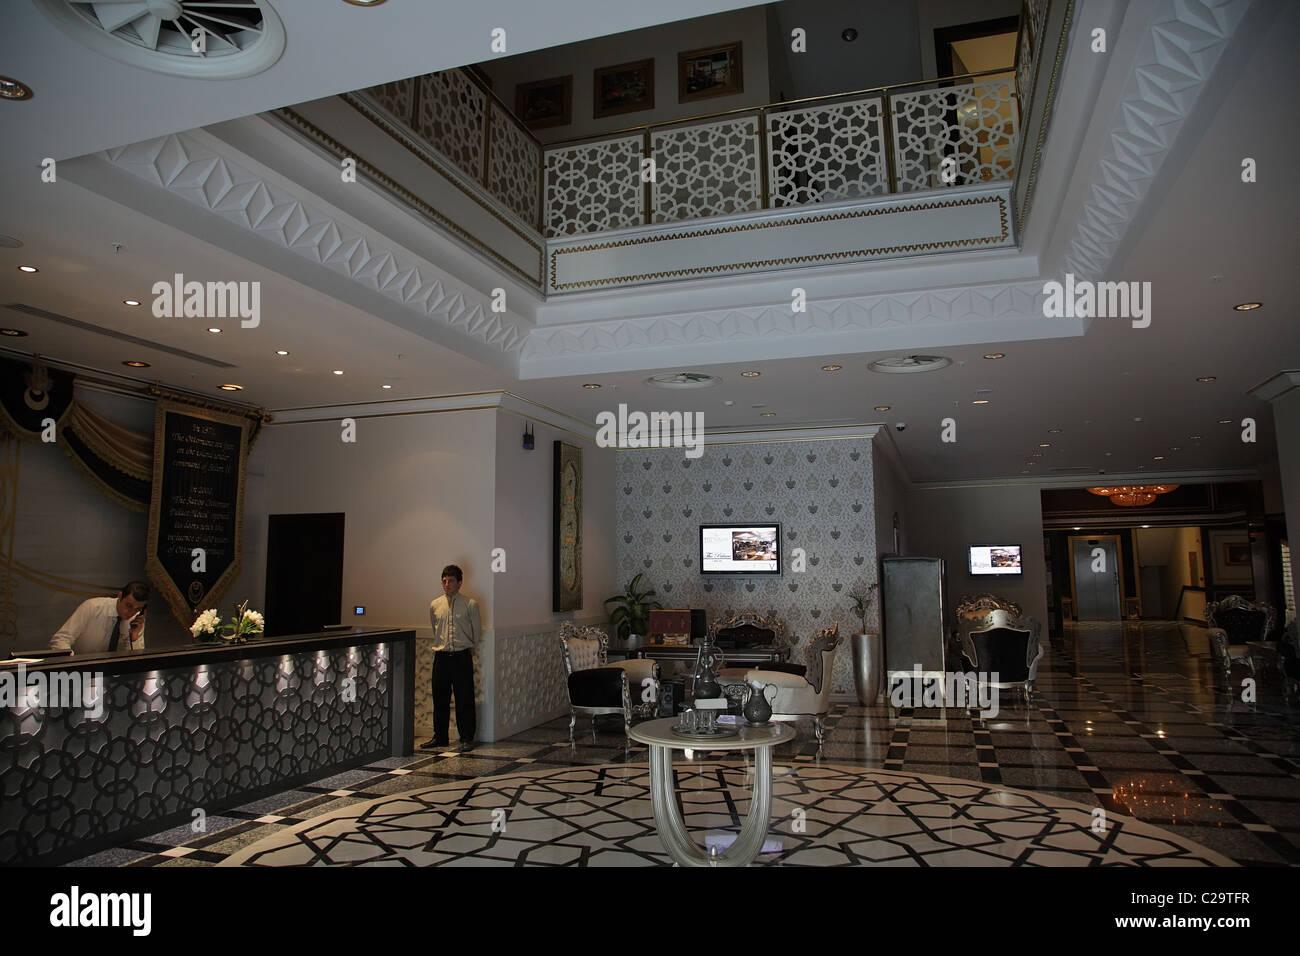 Lobby of the Savoy Ottoman Palace Hotel & Casino, Kyrenia, Turkish Republic of Northern Cyprus - Stock Image